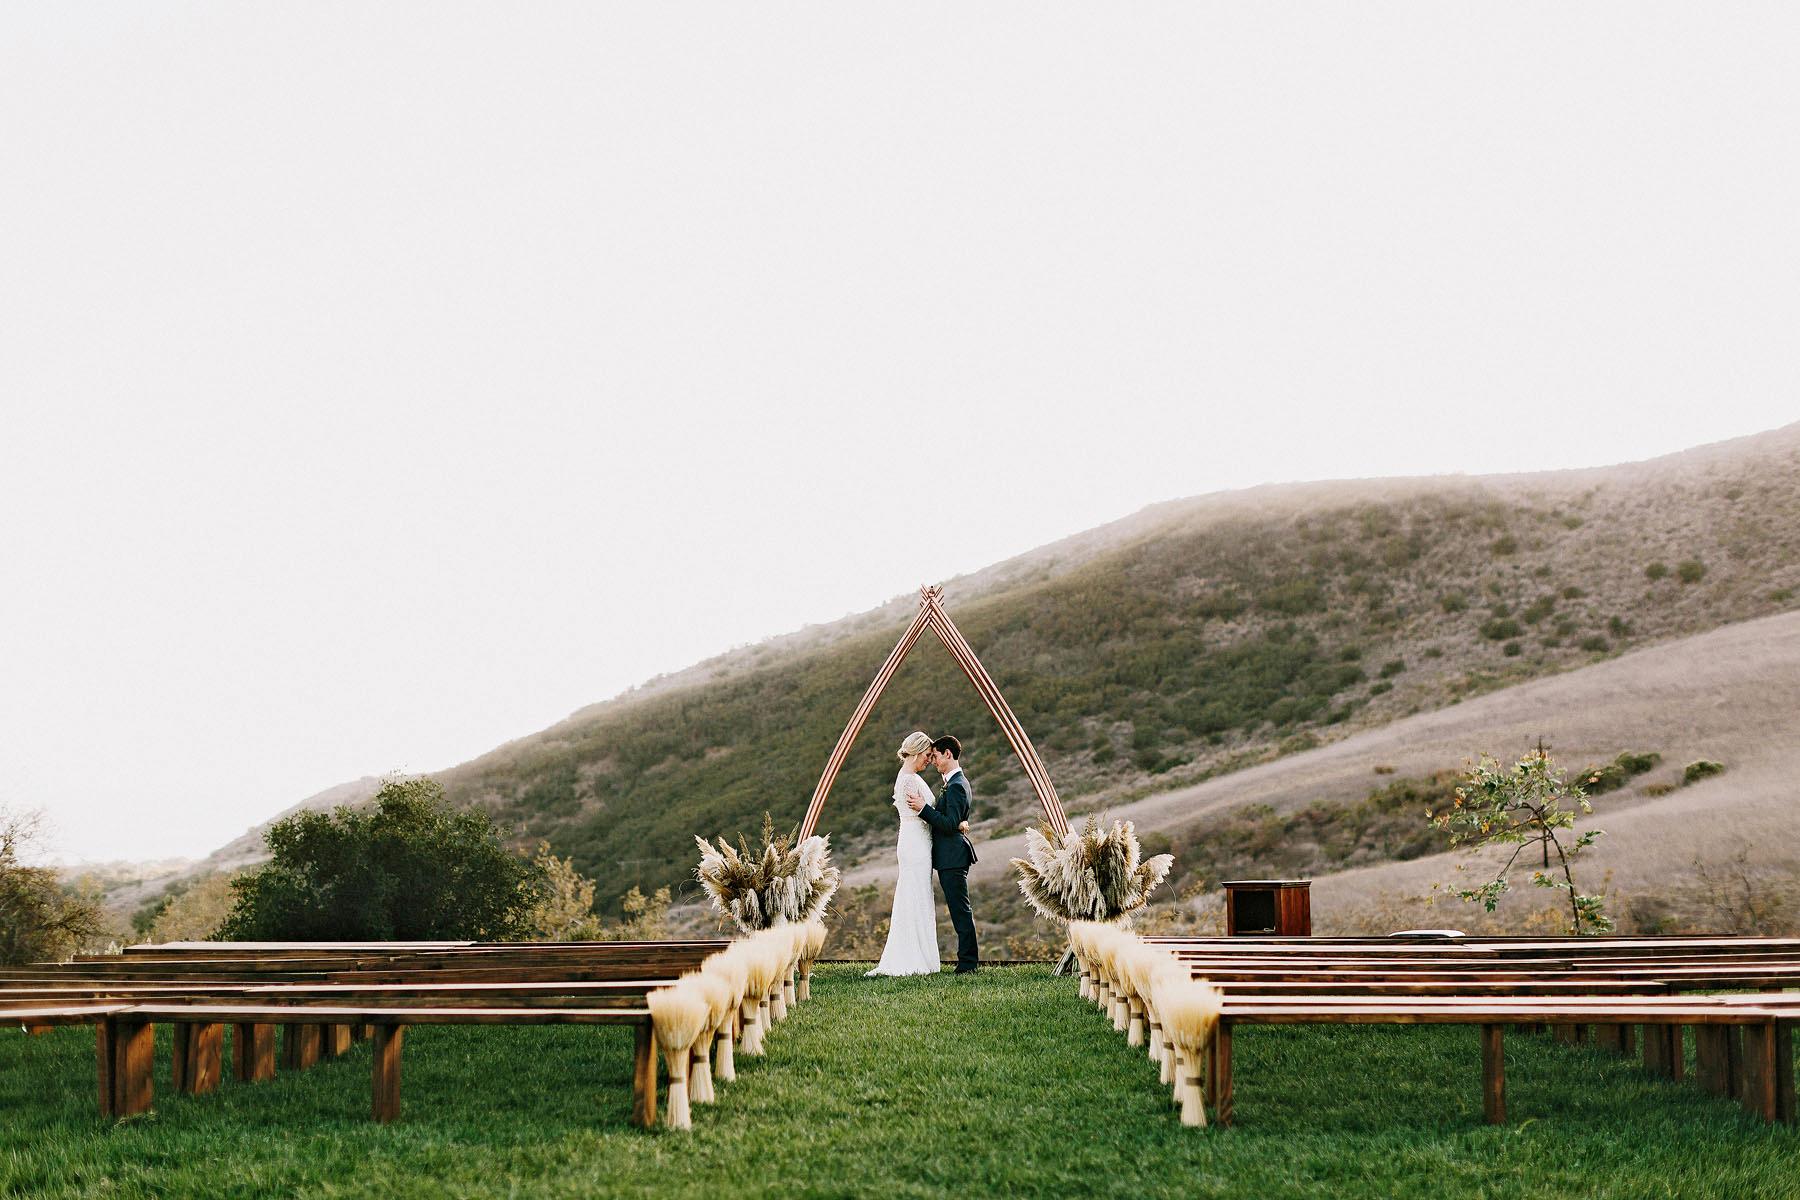 bride and groom at el capitan canyon in california